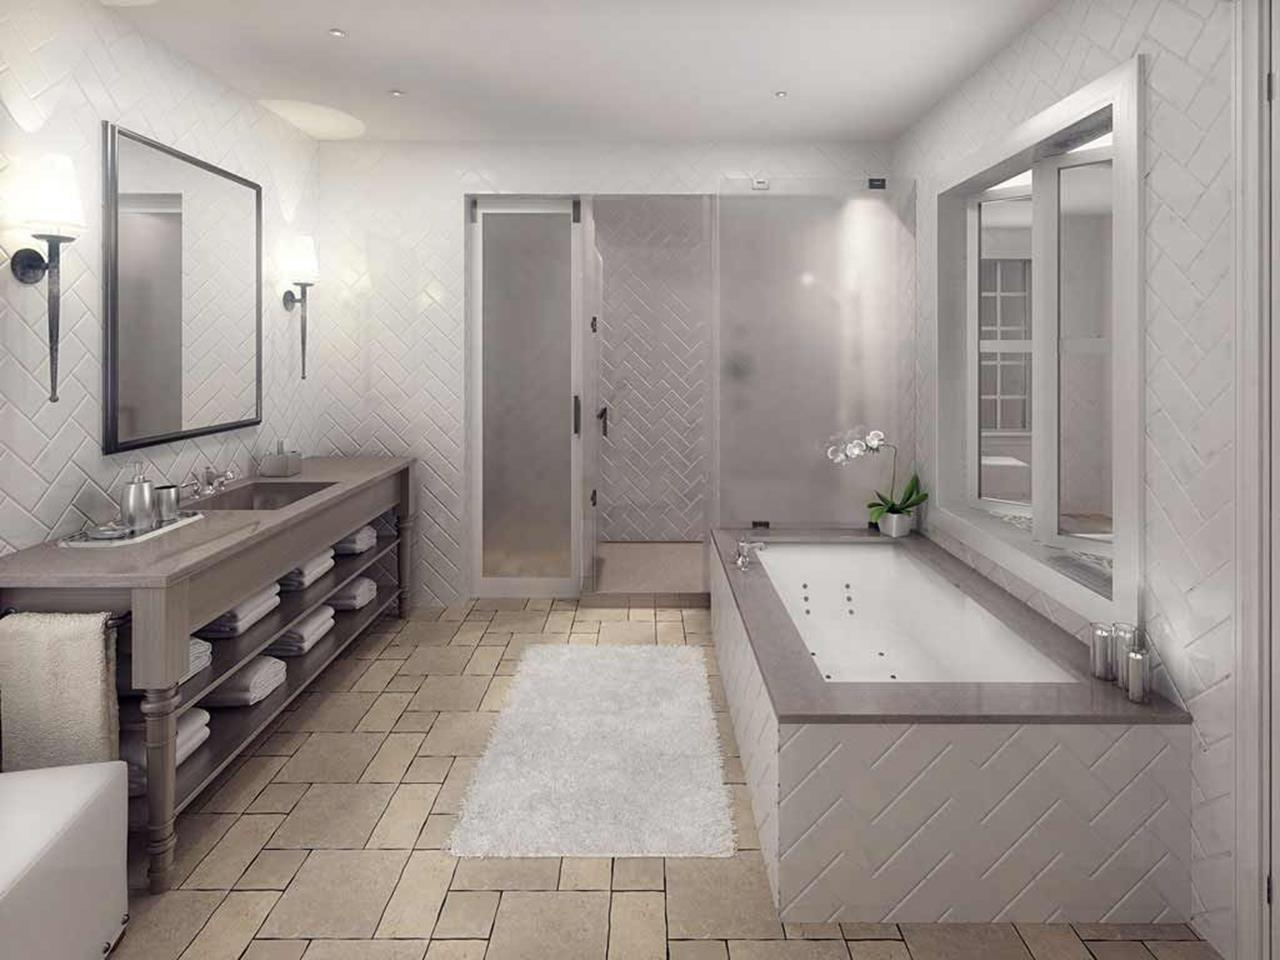 52 natural stone bathroom tile design  natural stone tile